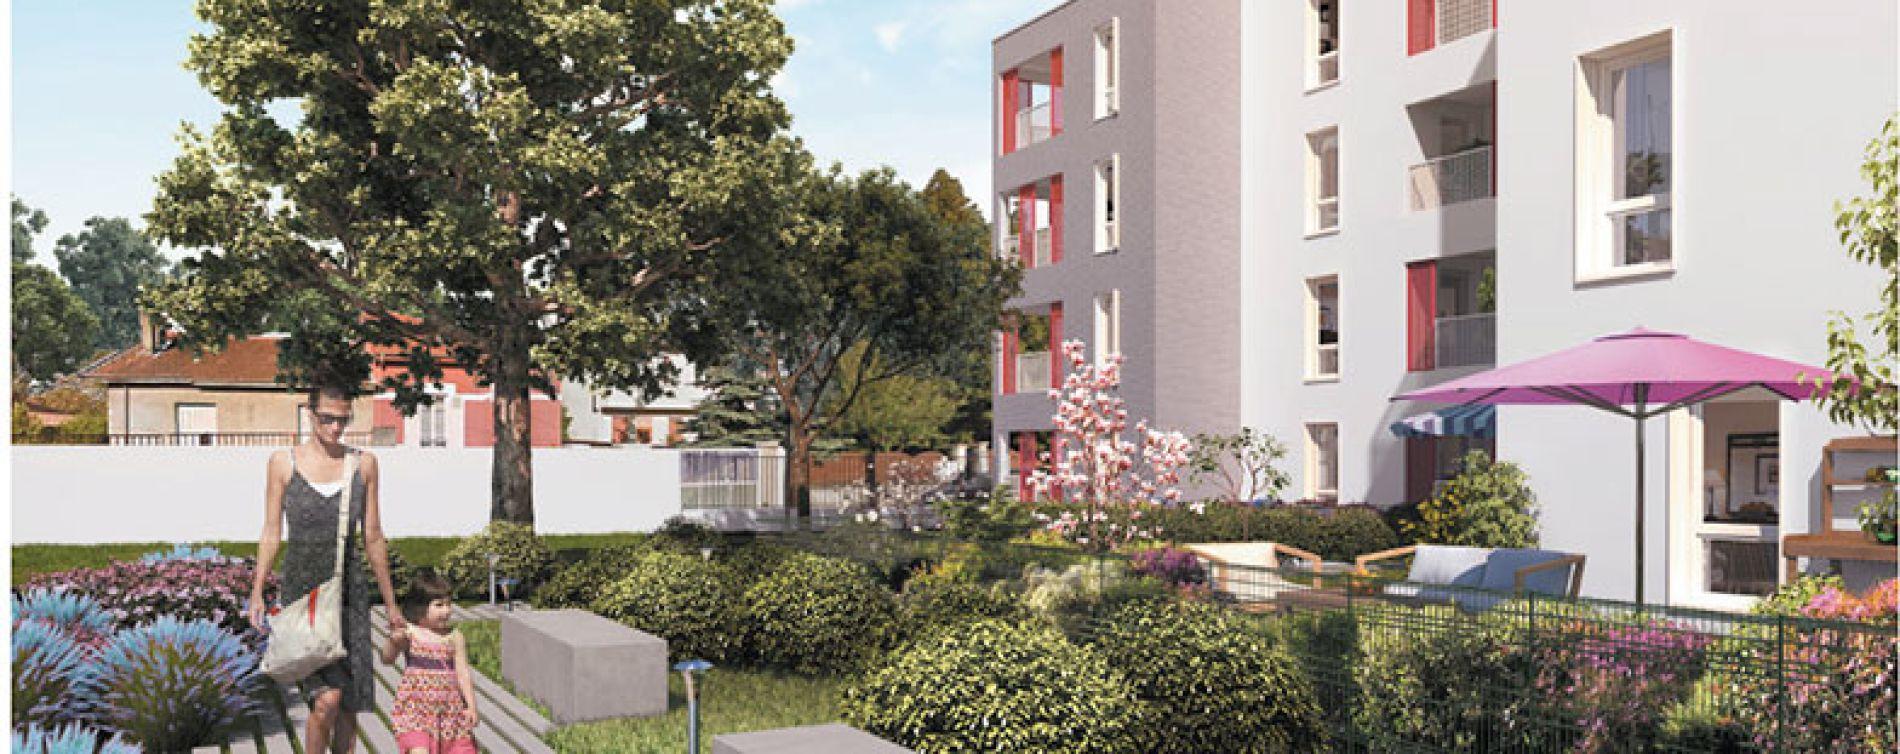 Villeurbanne : programme immobilier neuve « Octavie » (3)